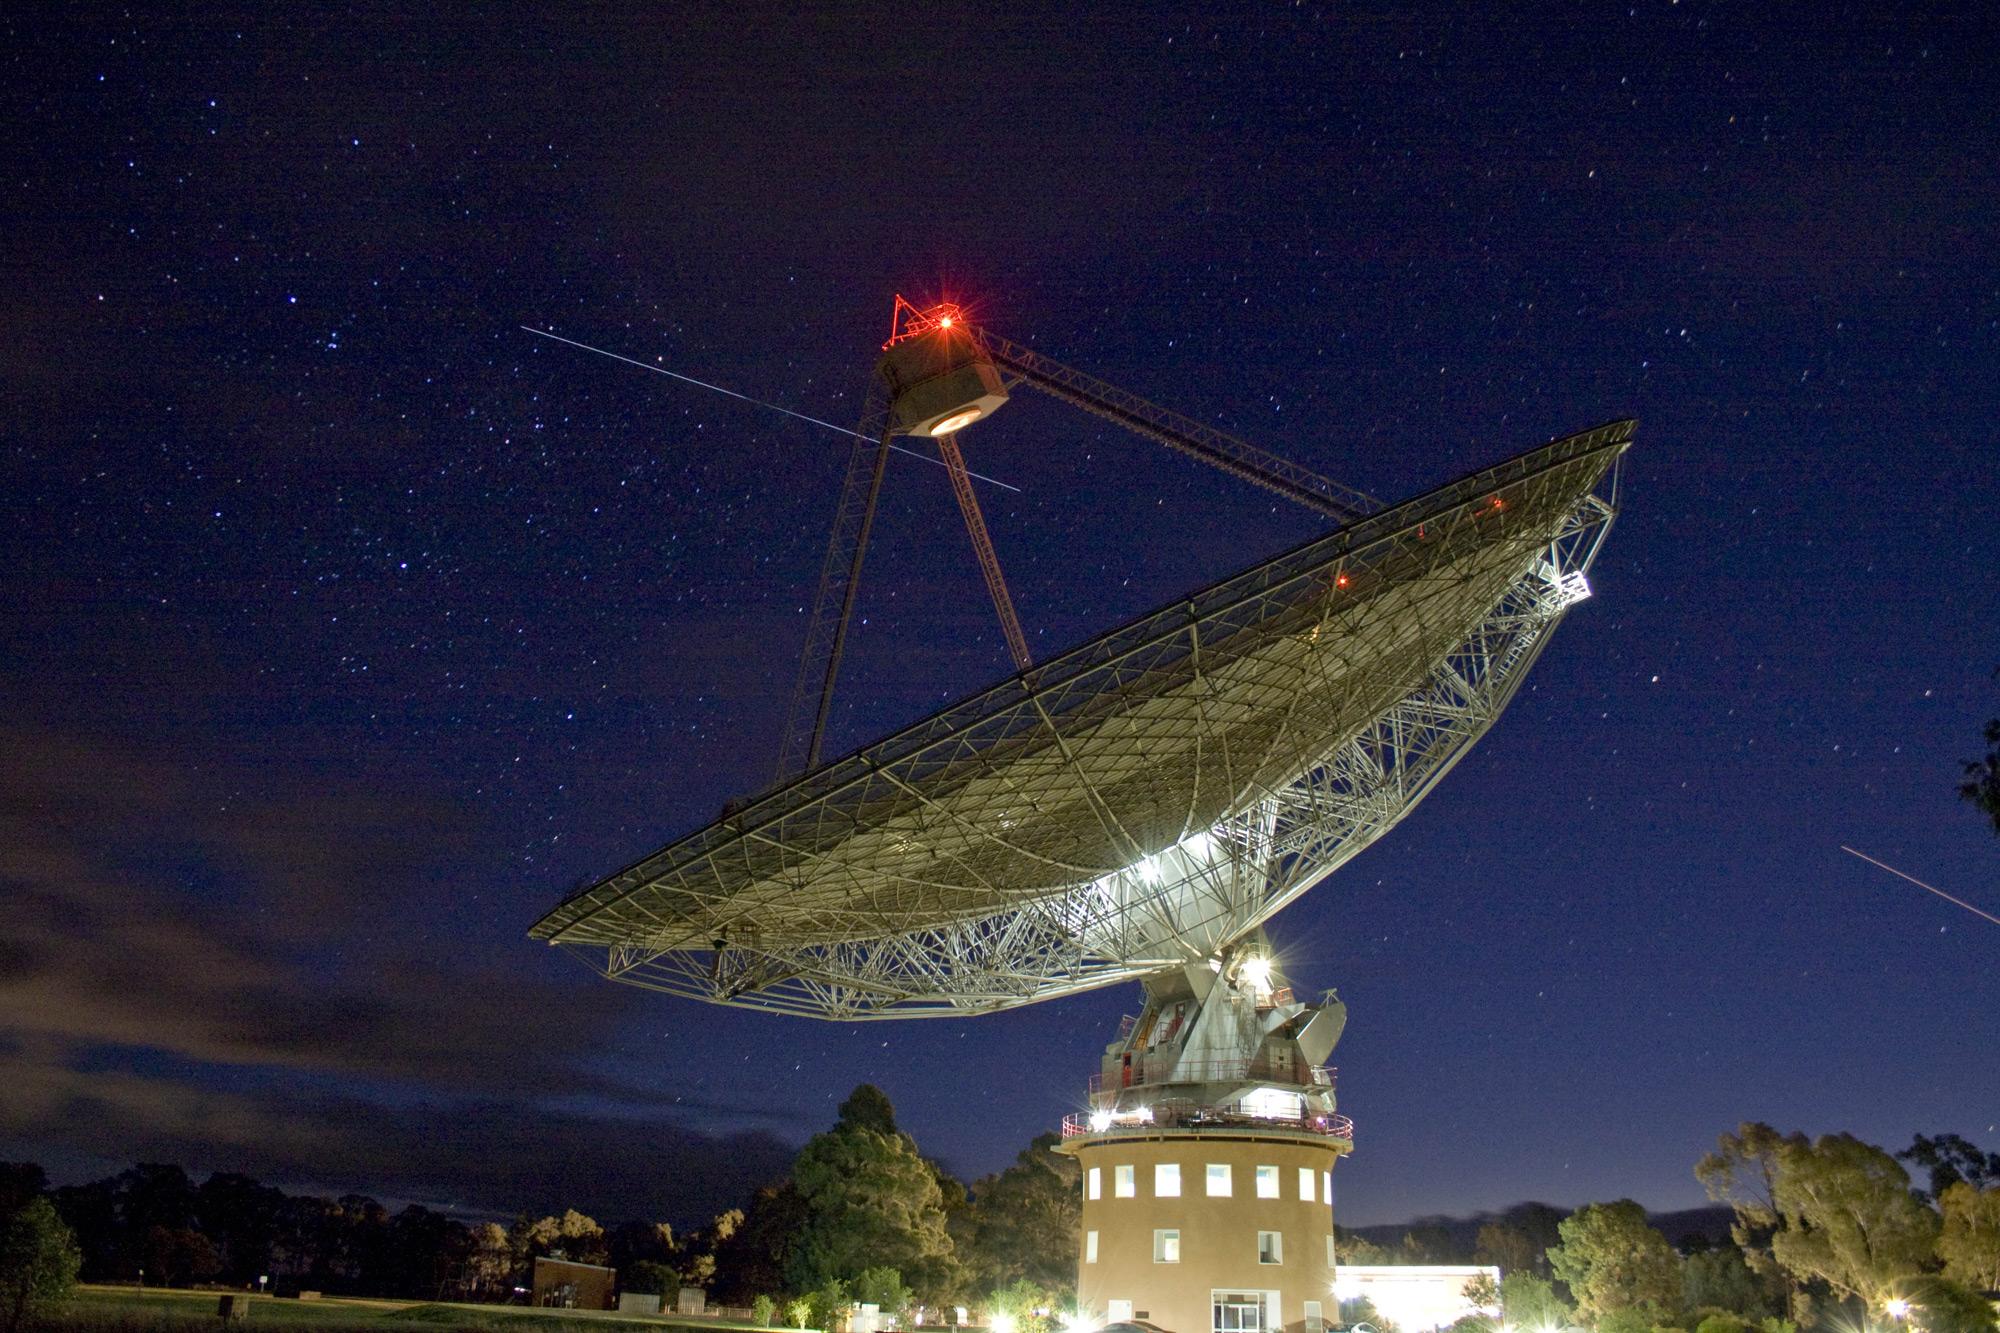 In a Land Down Under, Where Spacecraft Glow  In a Land Down Under, Where Spacecraft Glow